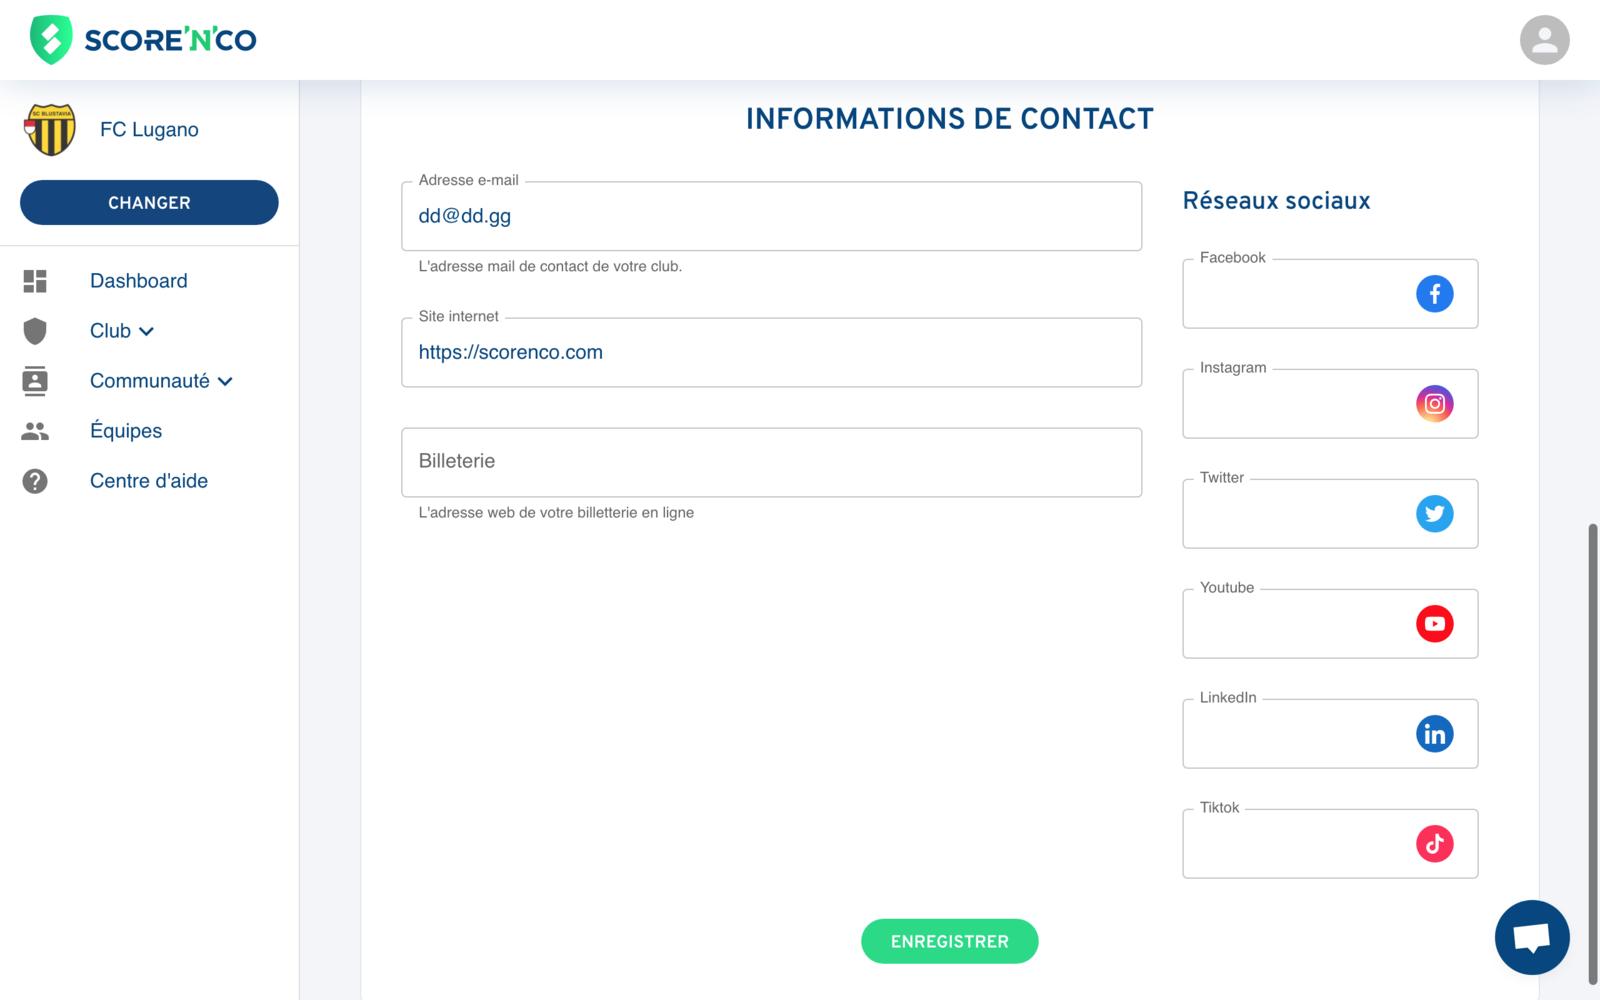 Rubrique Club - Onglet Informations de contact - Score'n'co